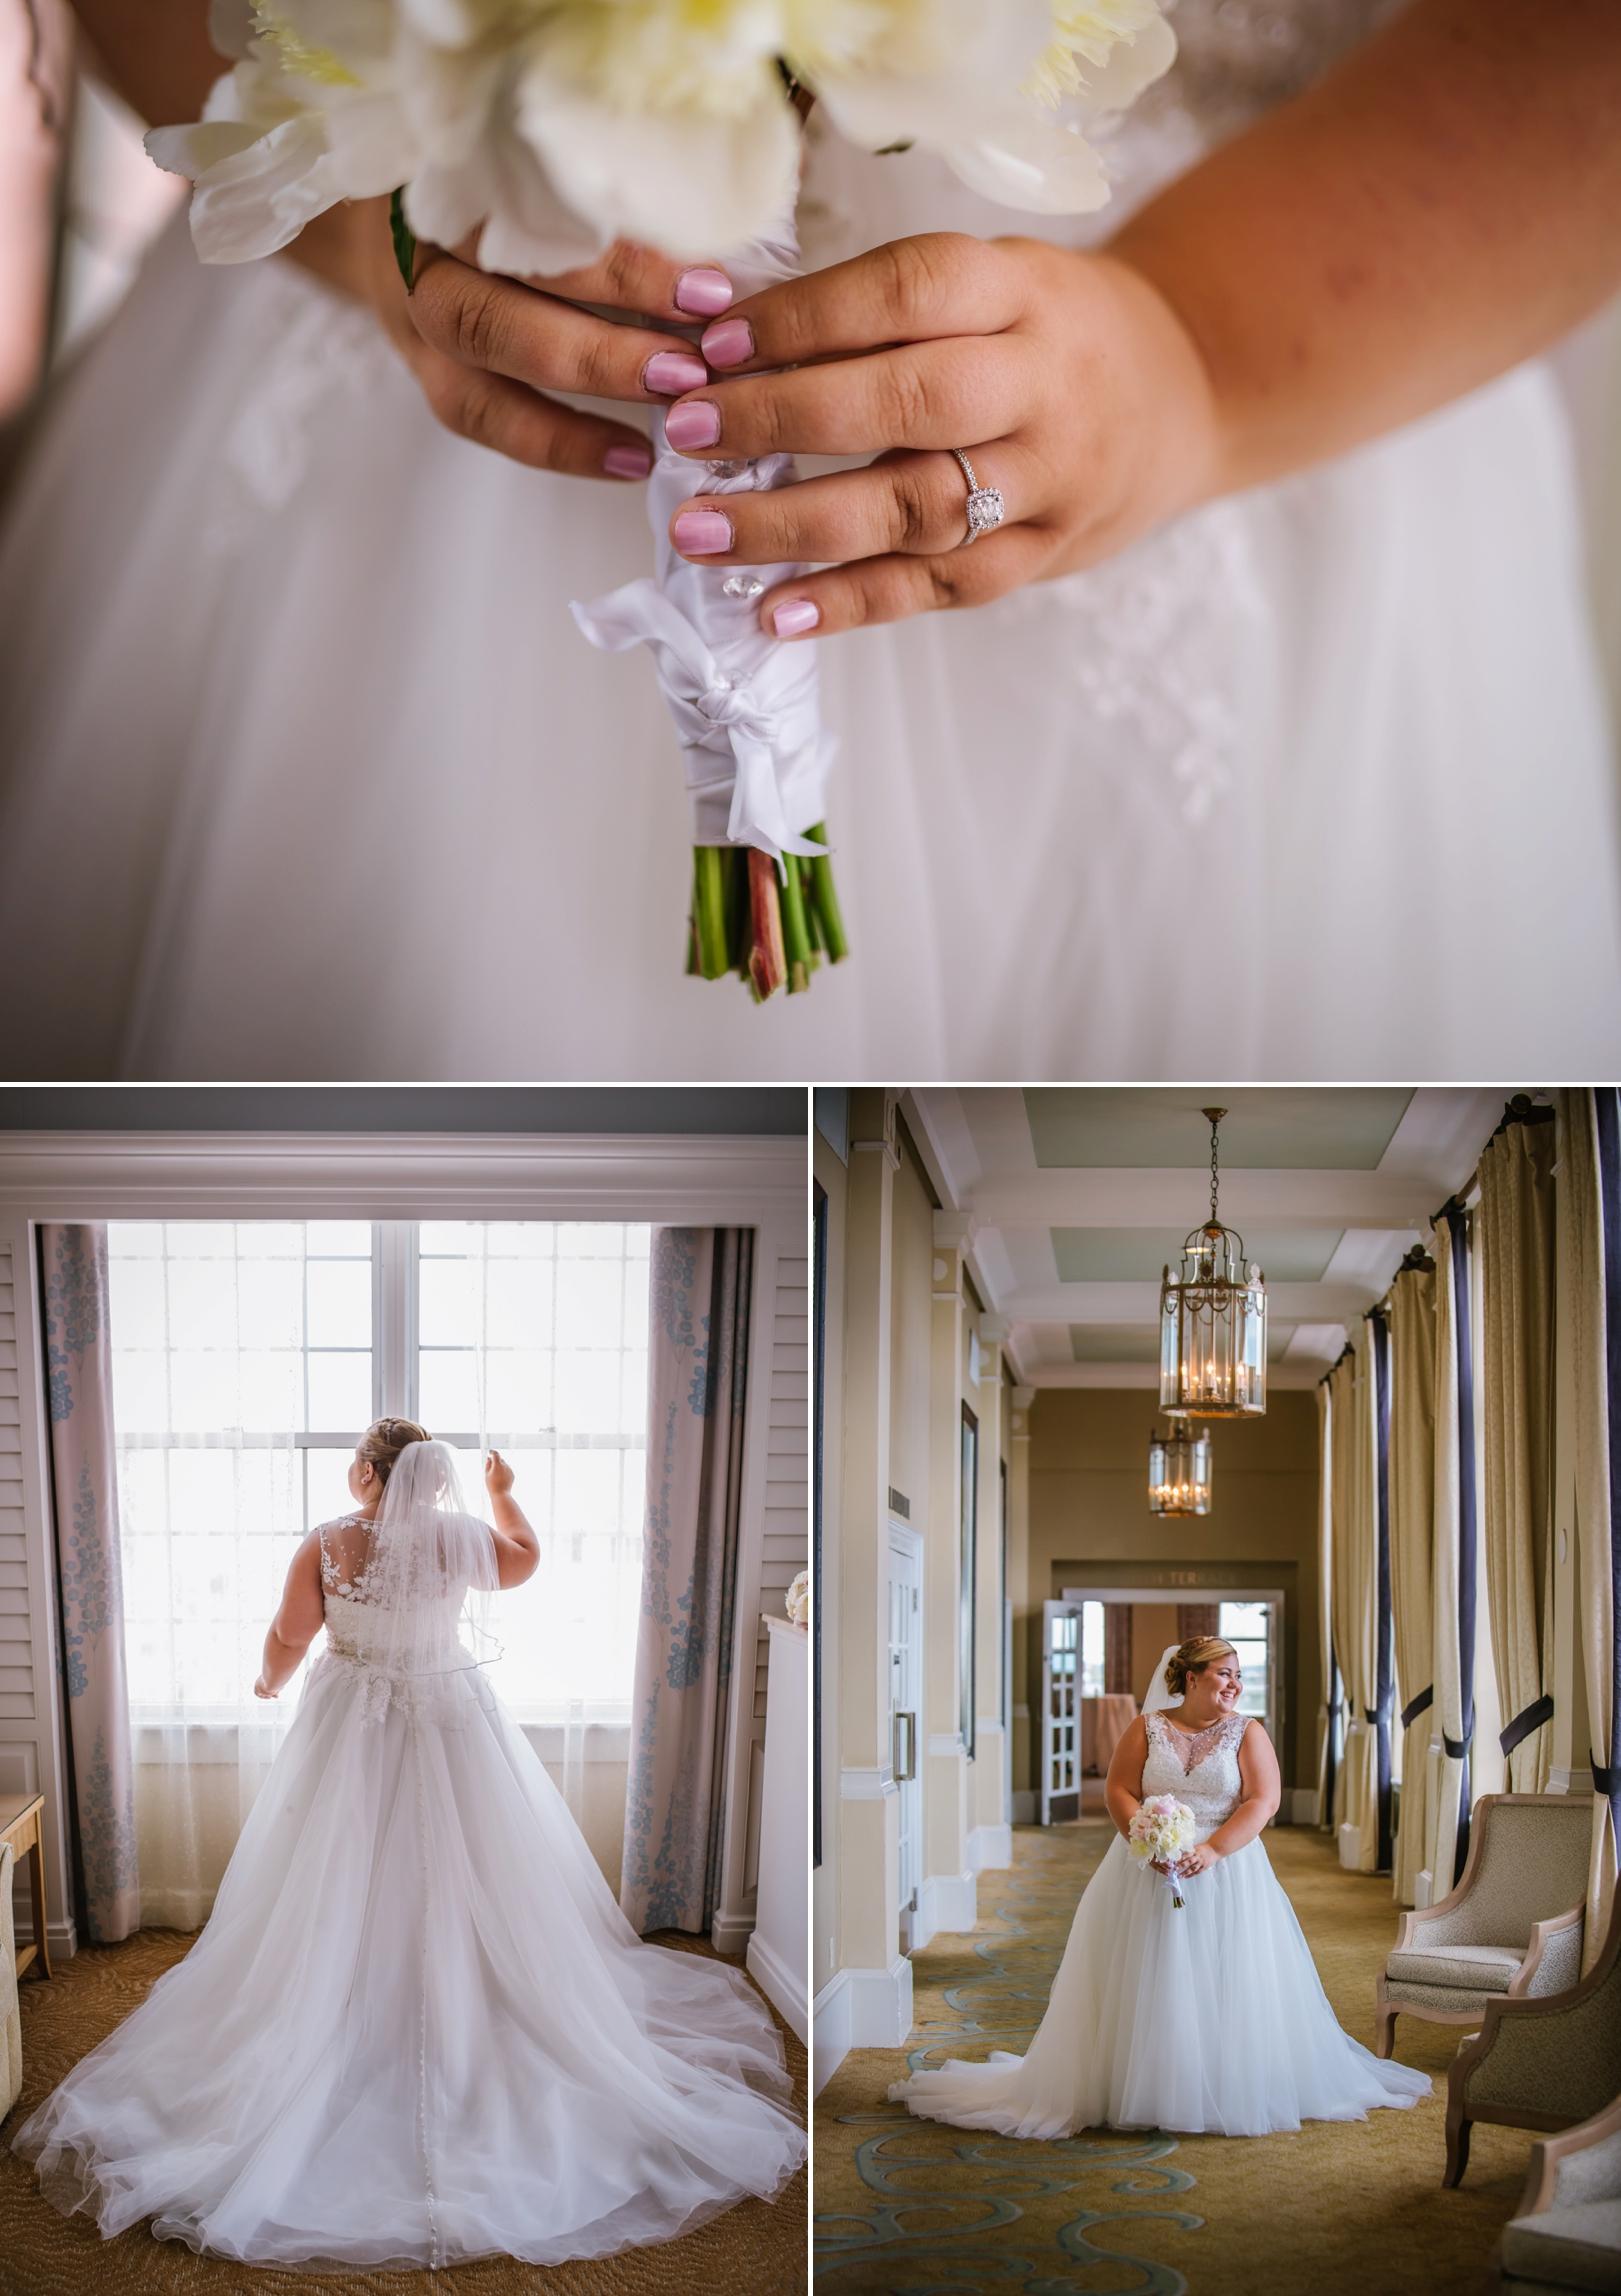 St-pete-wedding-photographer-don-caesar-ashlee-hamon_0010.jpg